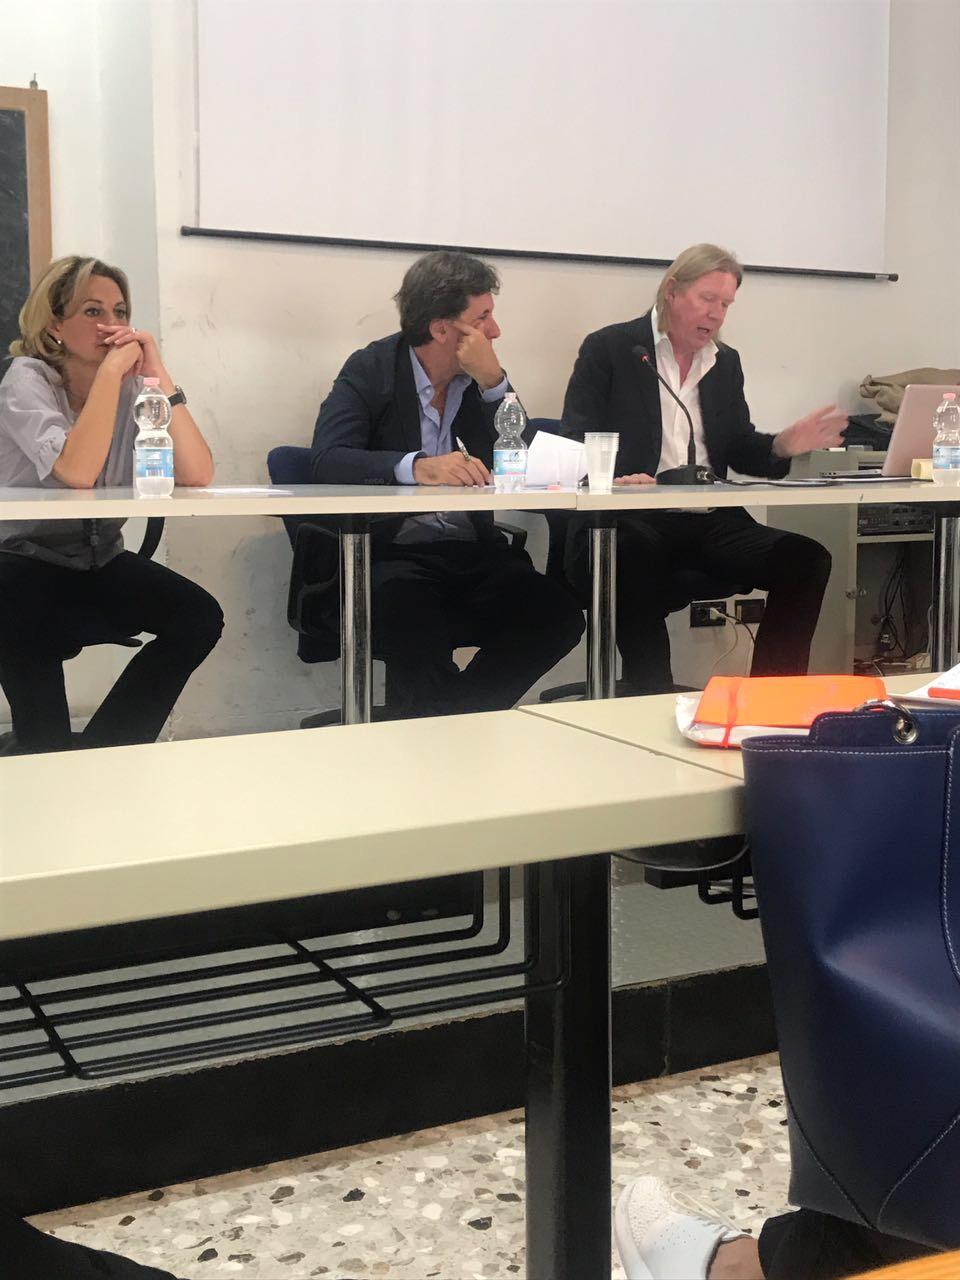 Claudia Megale, Fabrizio Lomonaco, Matthias Kauffman